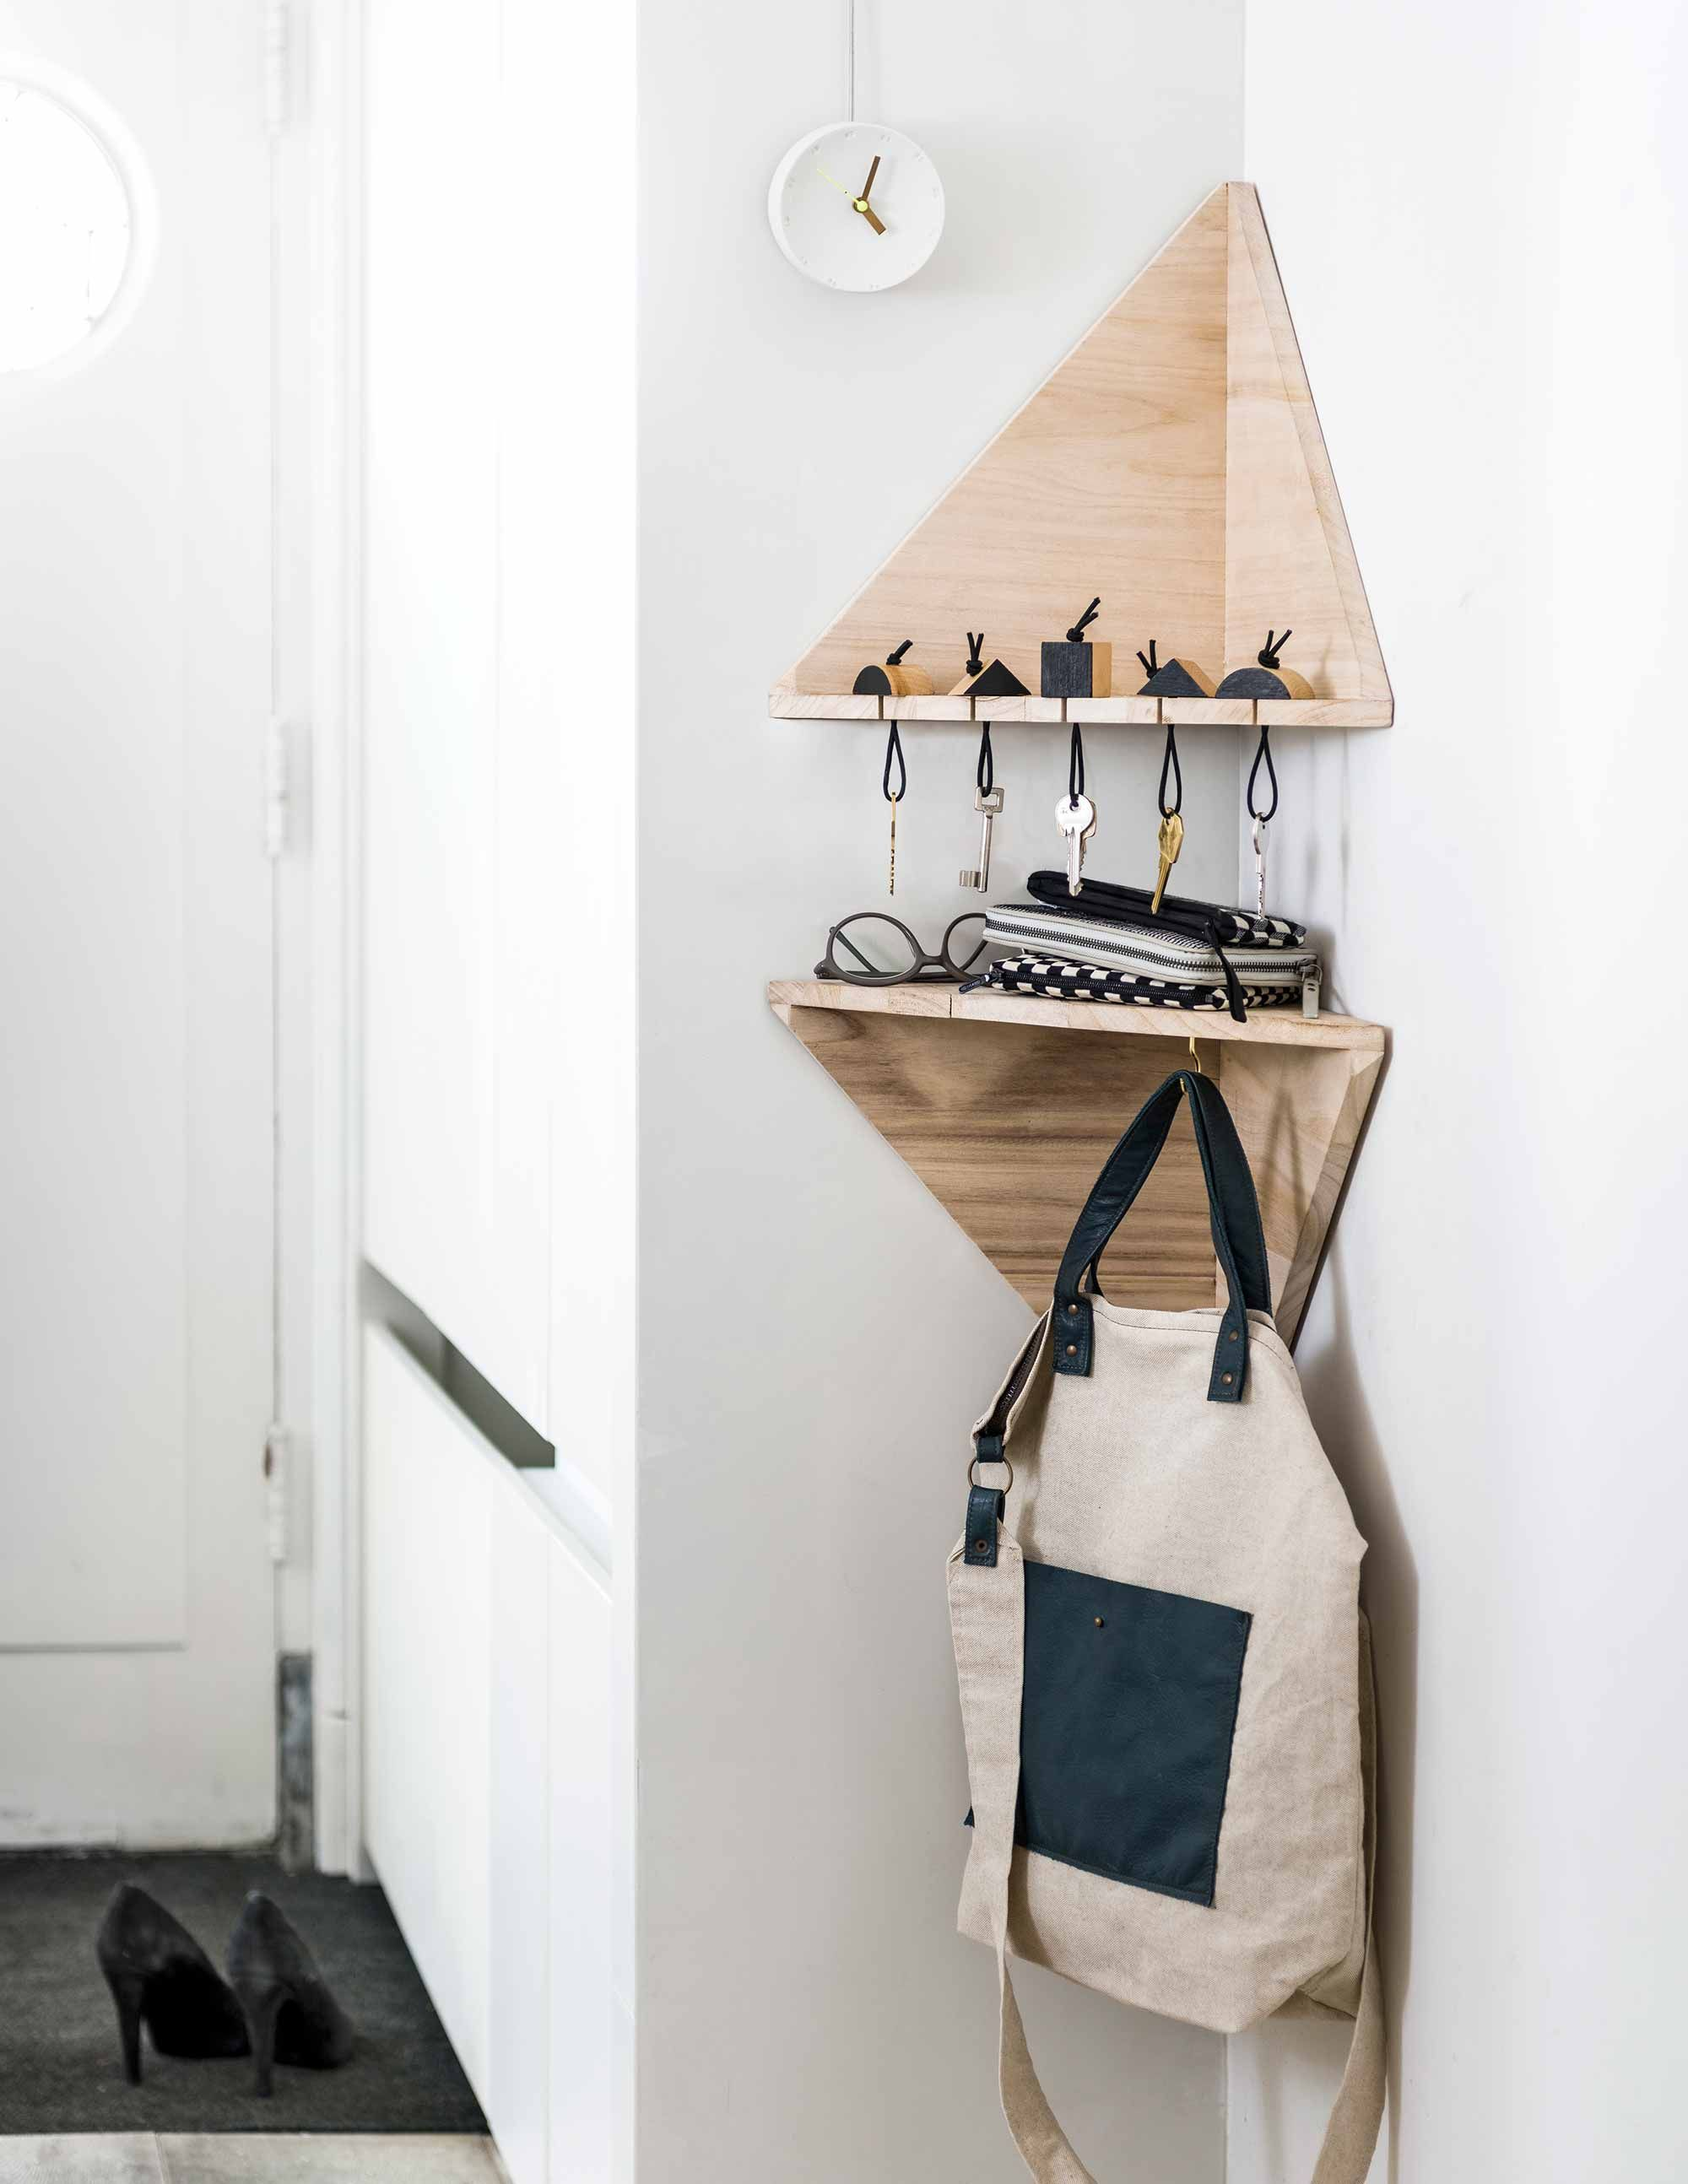 Hallway storage rack  étagère triangle  Hal  Pinterest  Key Corner and Shelves